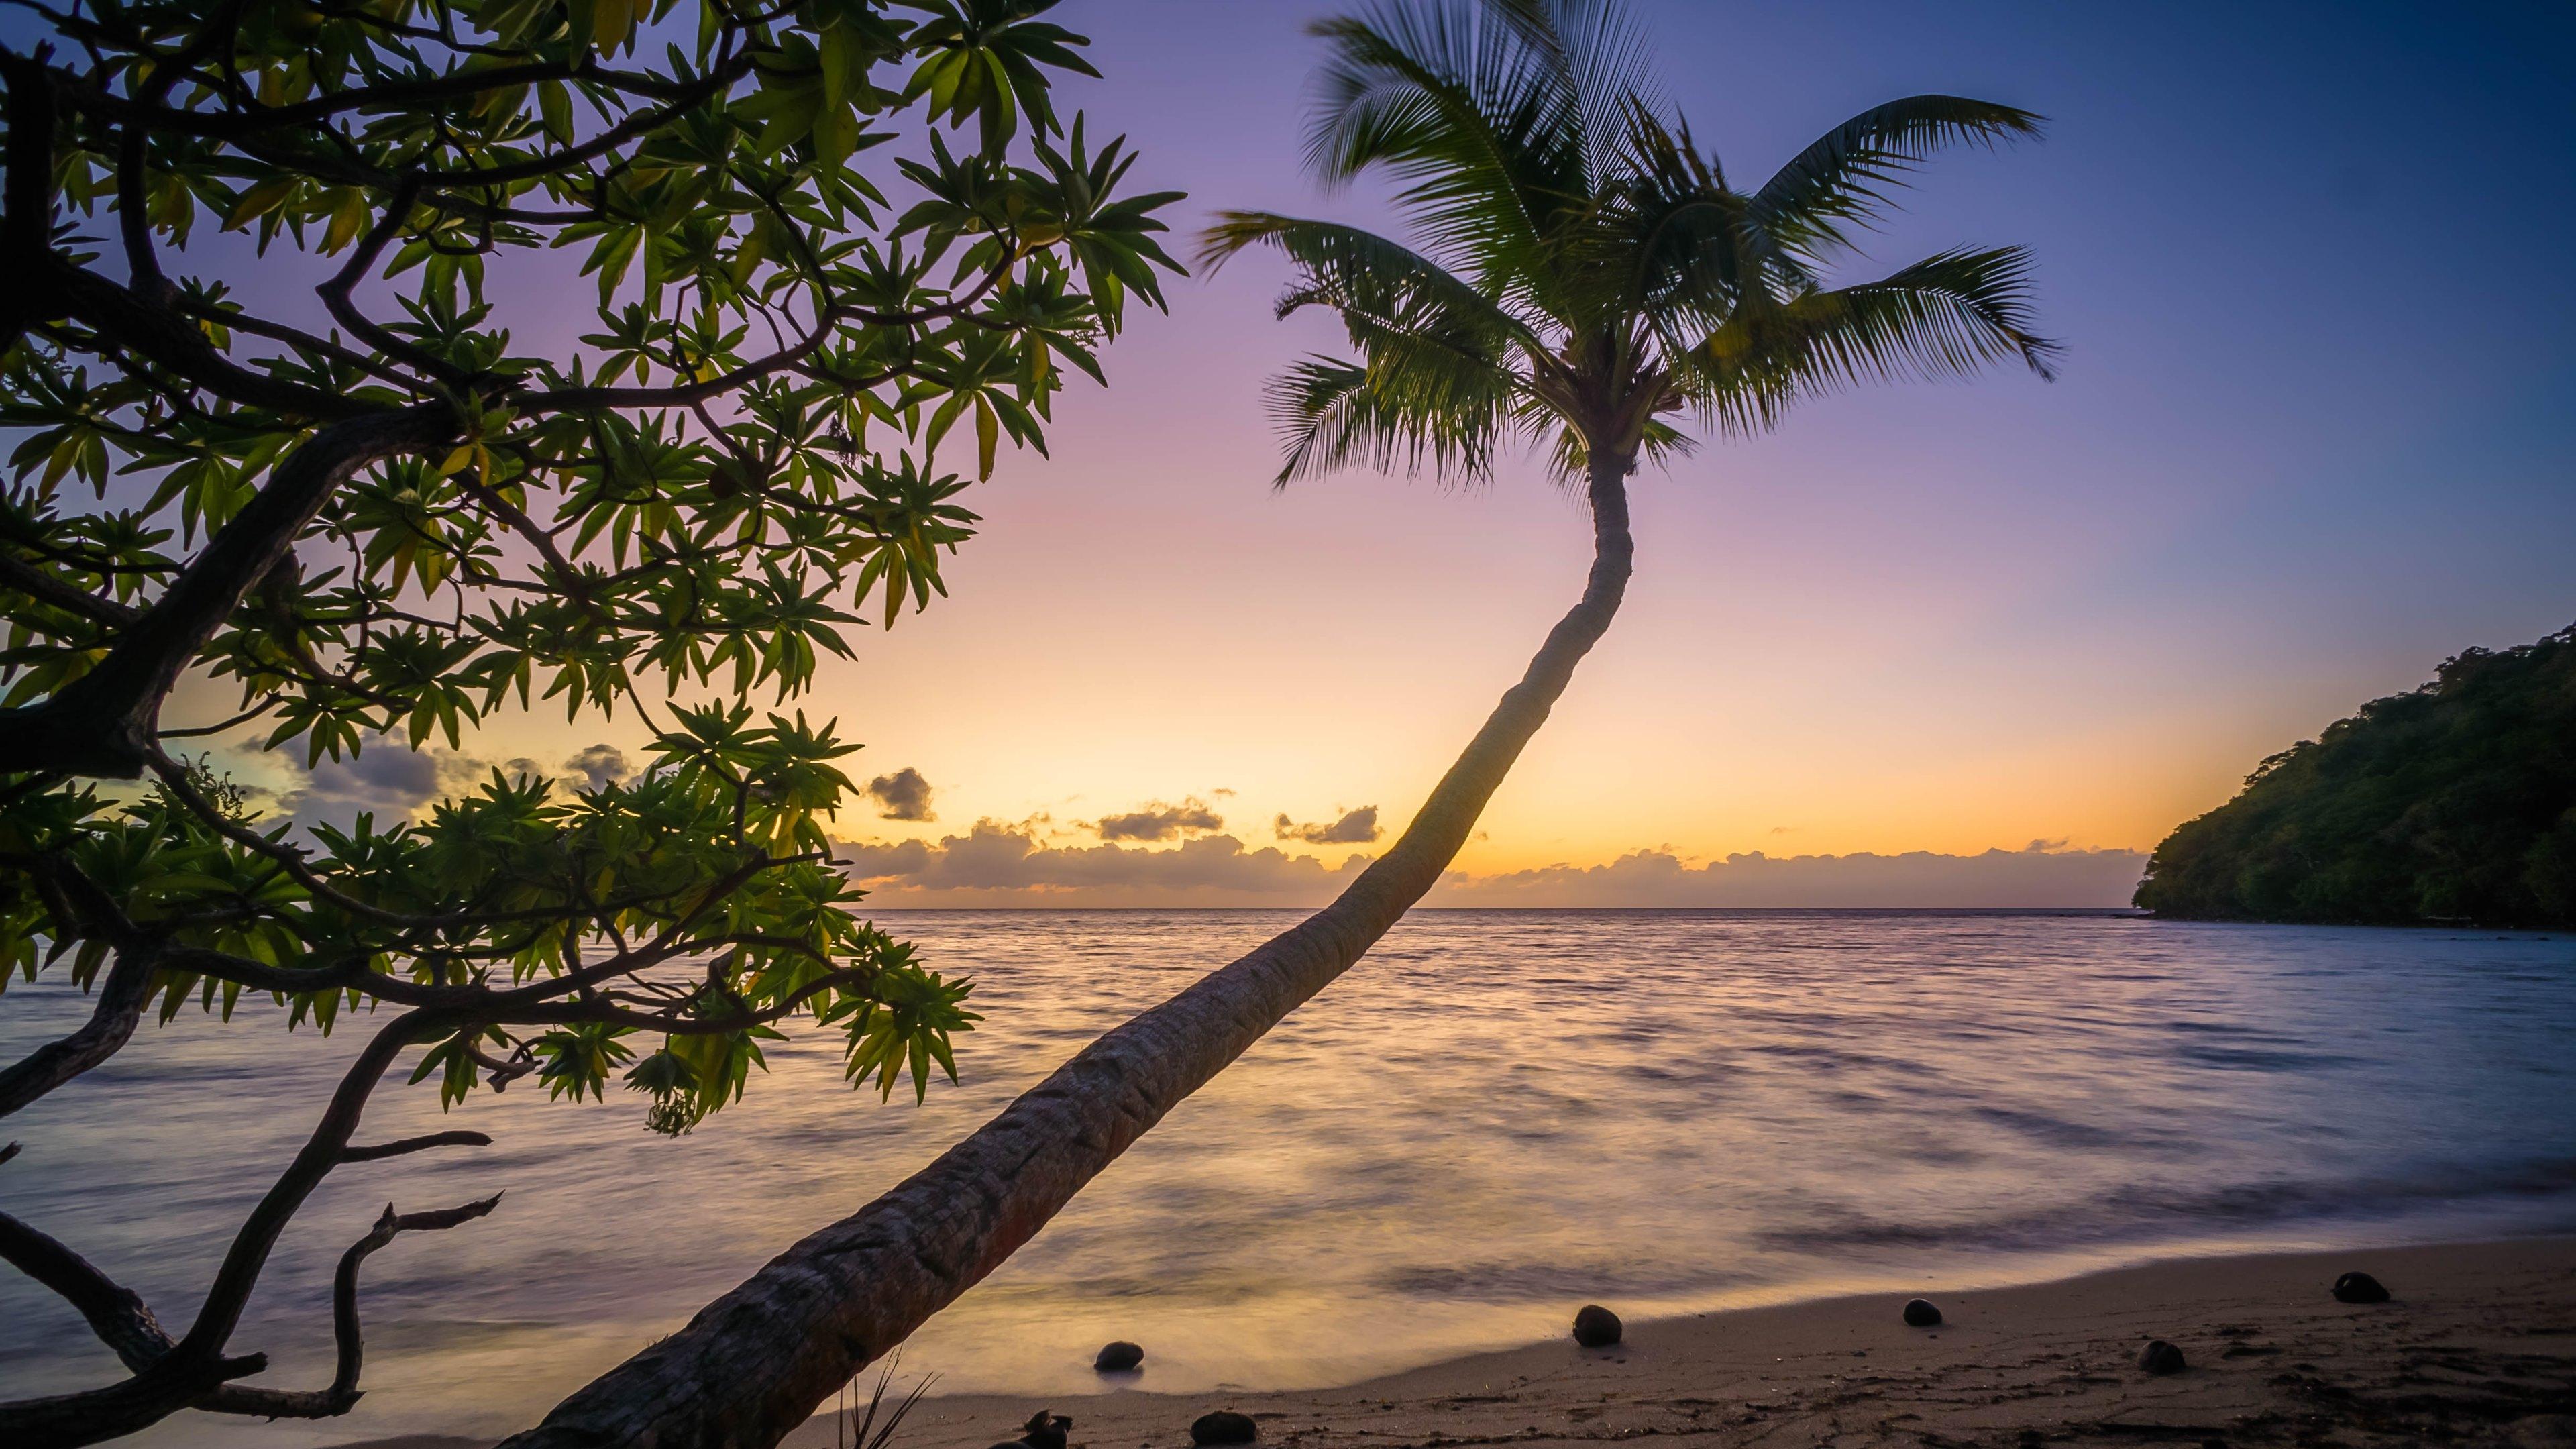 Exotic Holiday, beach, ocean, paradise, palm tree, sunset, coast, waves